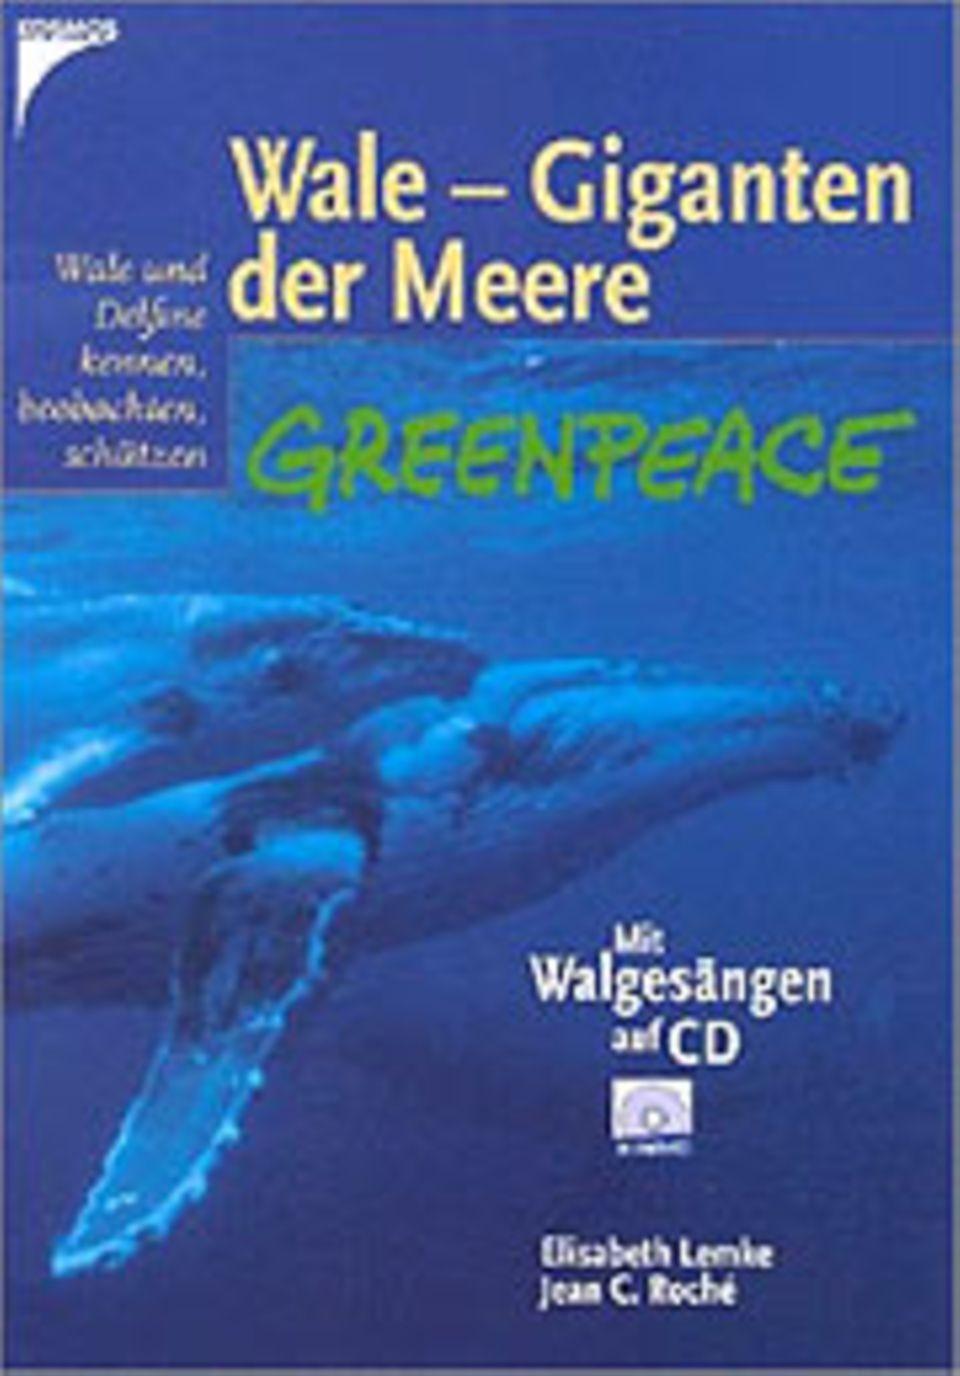 Buch-Tipp: Wale - Giganten der Meere